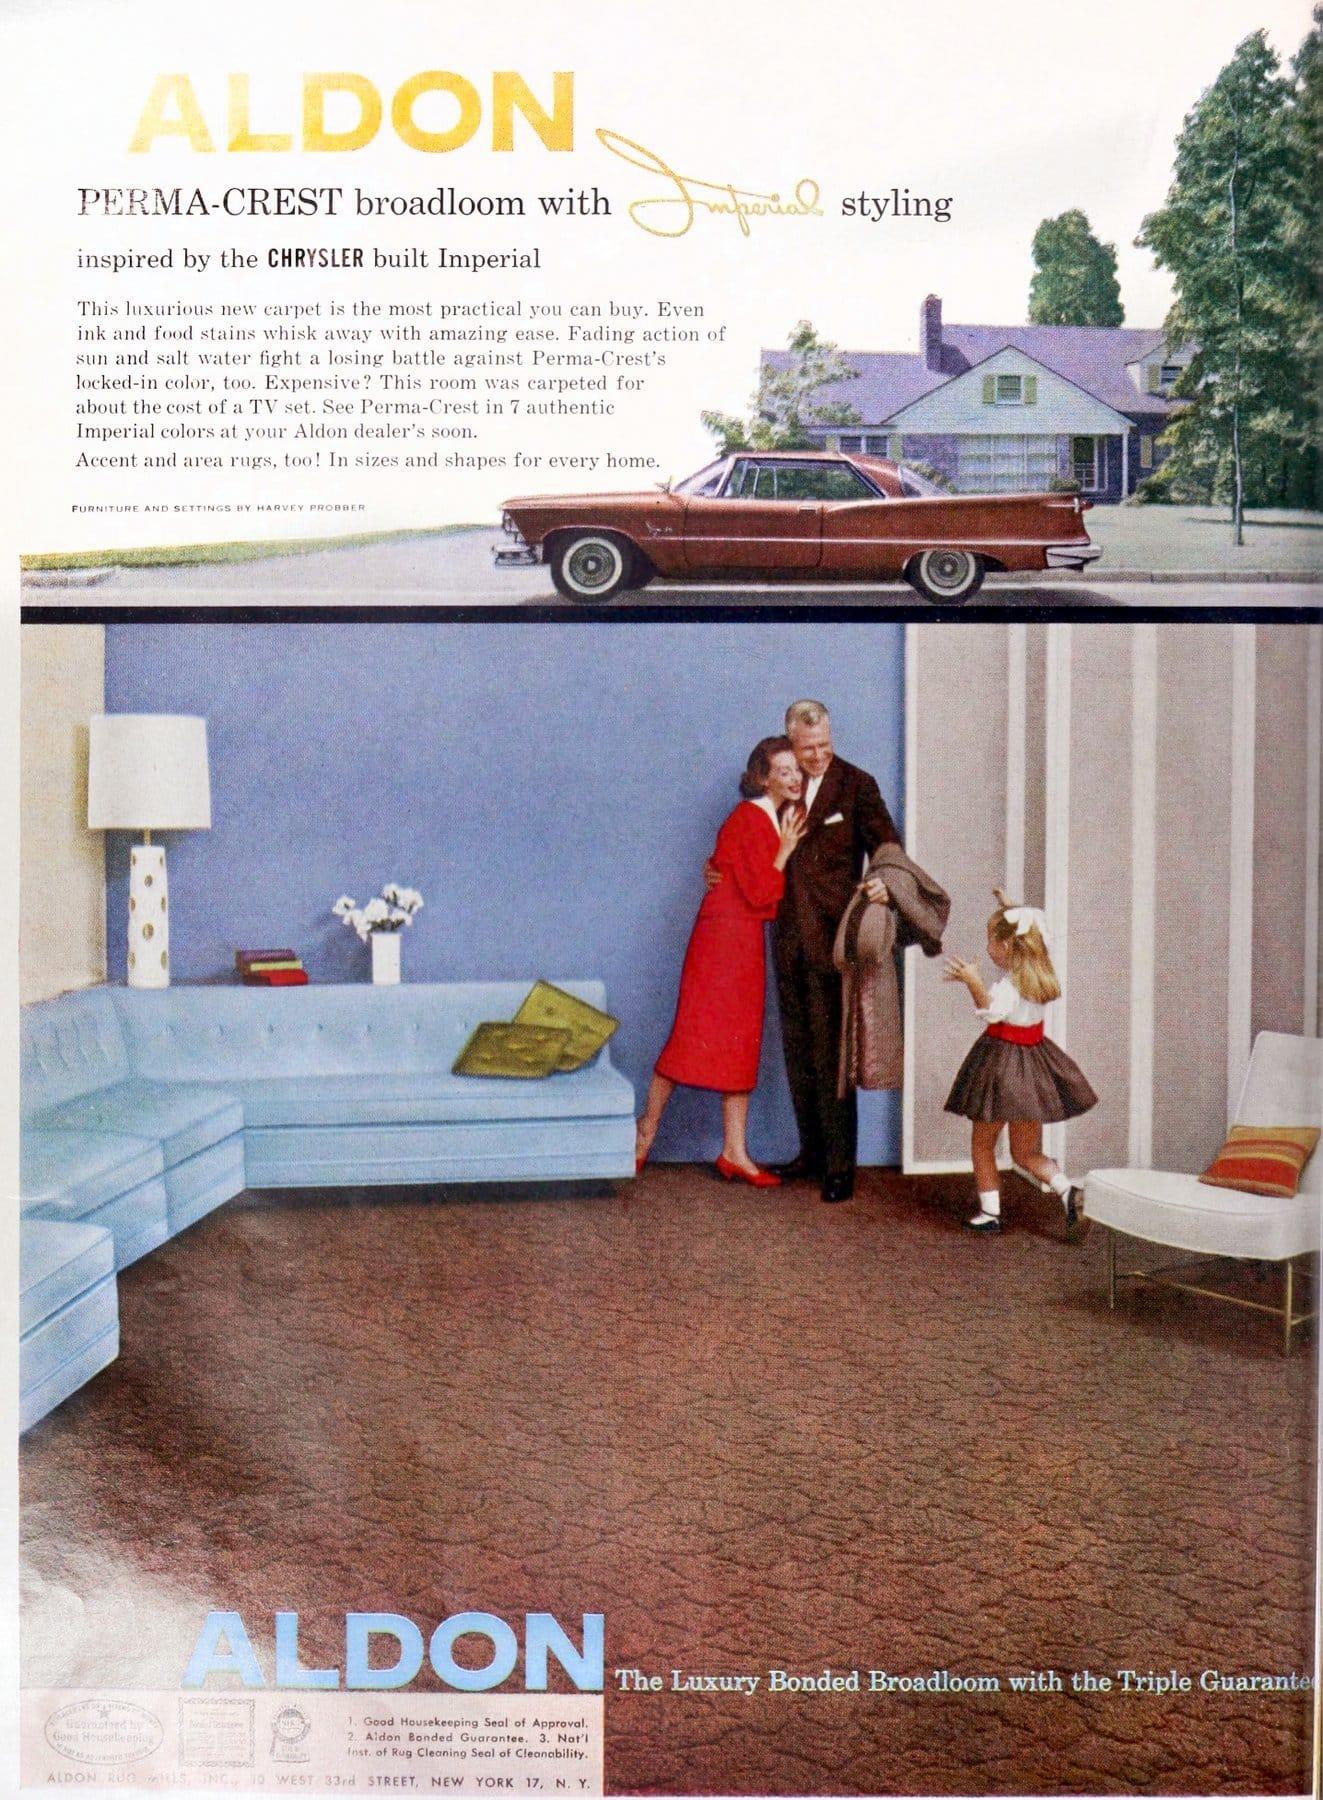 Vintage fifties Aldon broadloom carpet with pattern (1958)